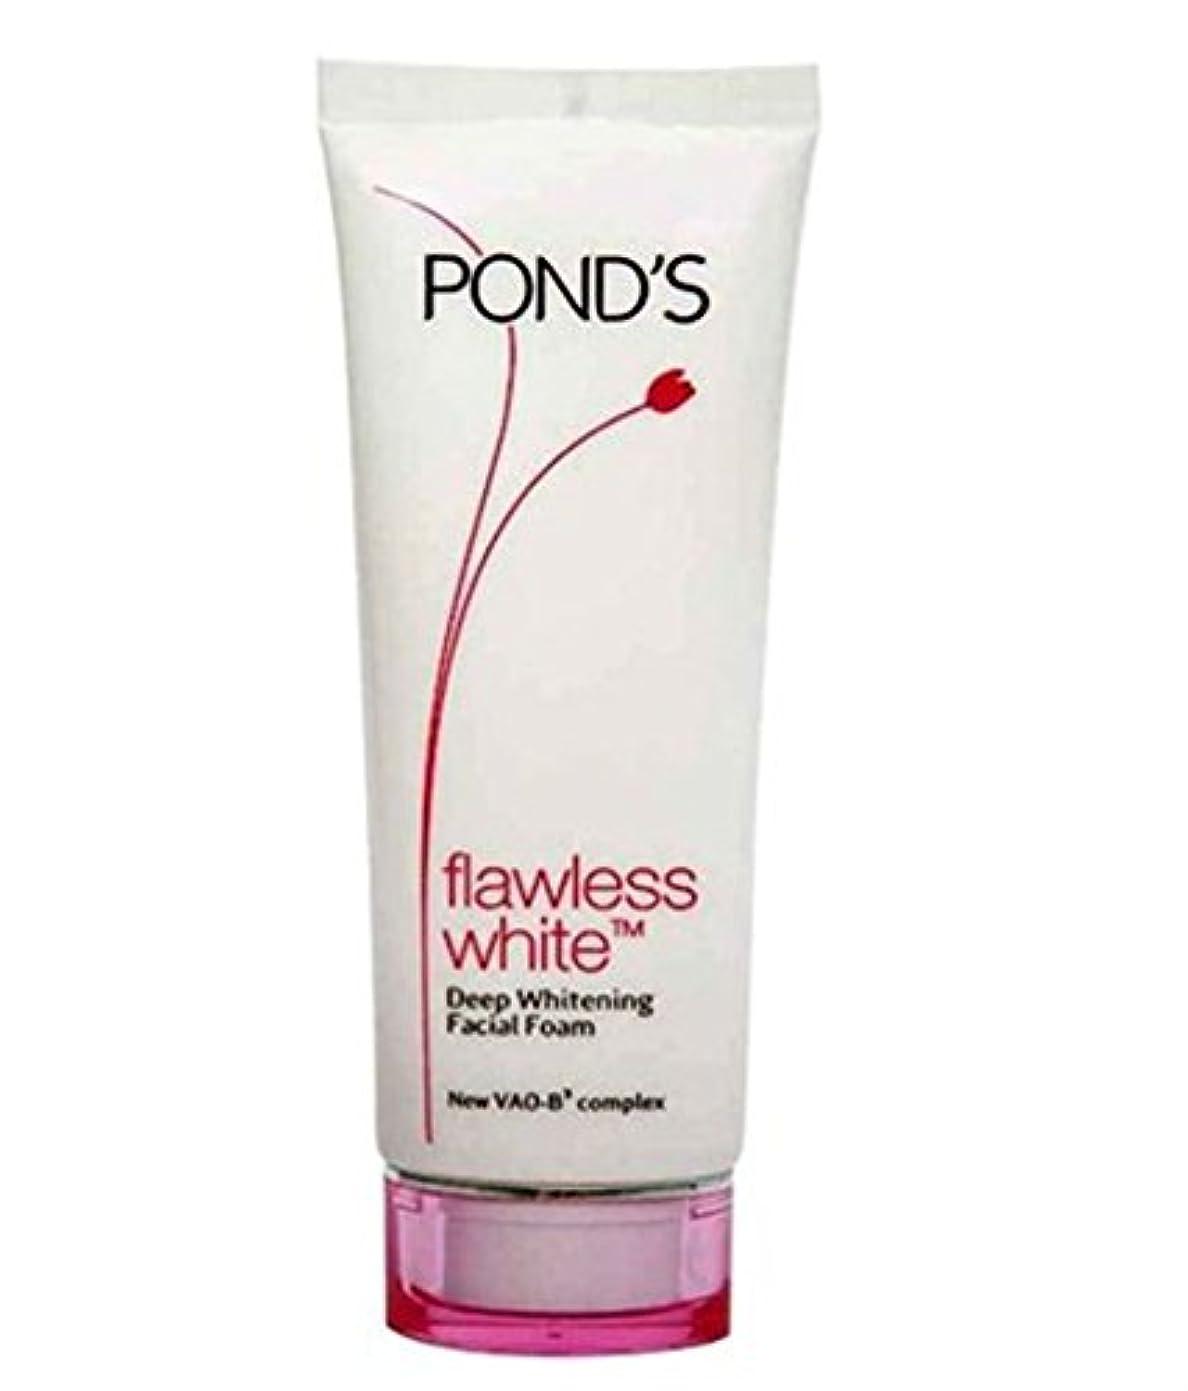 Pond's Flawless White Deep Whitening Facial Foam, 100g